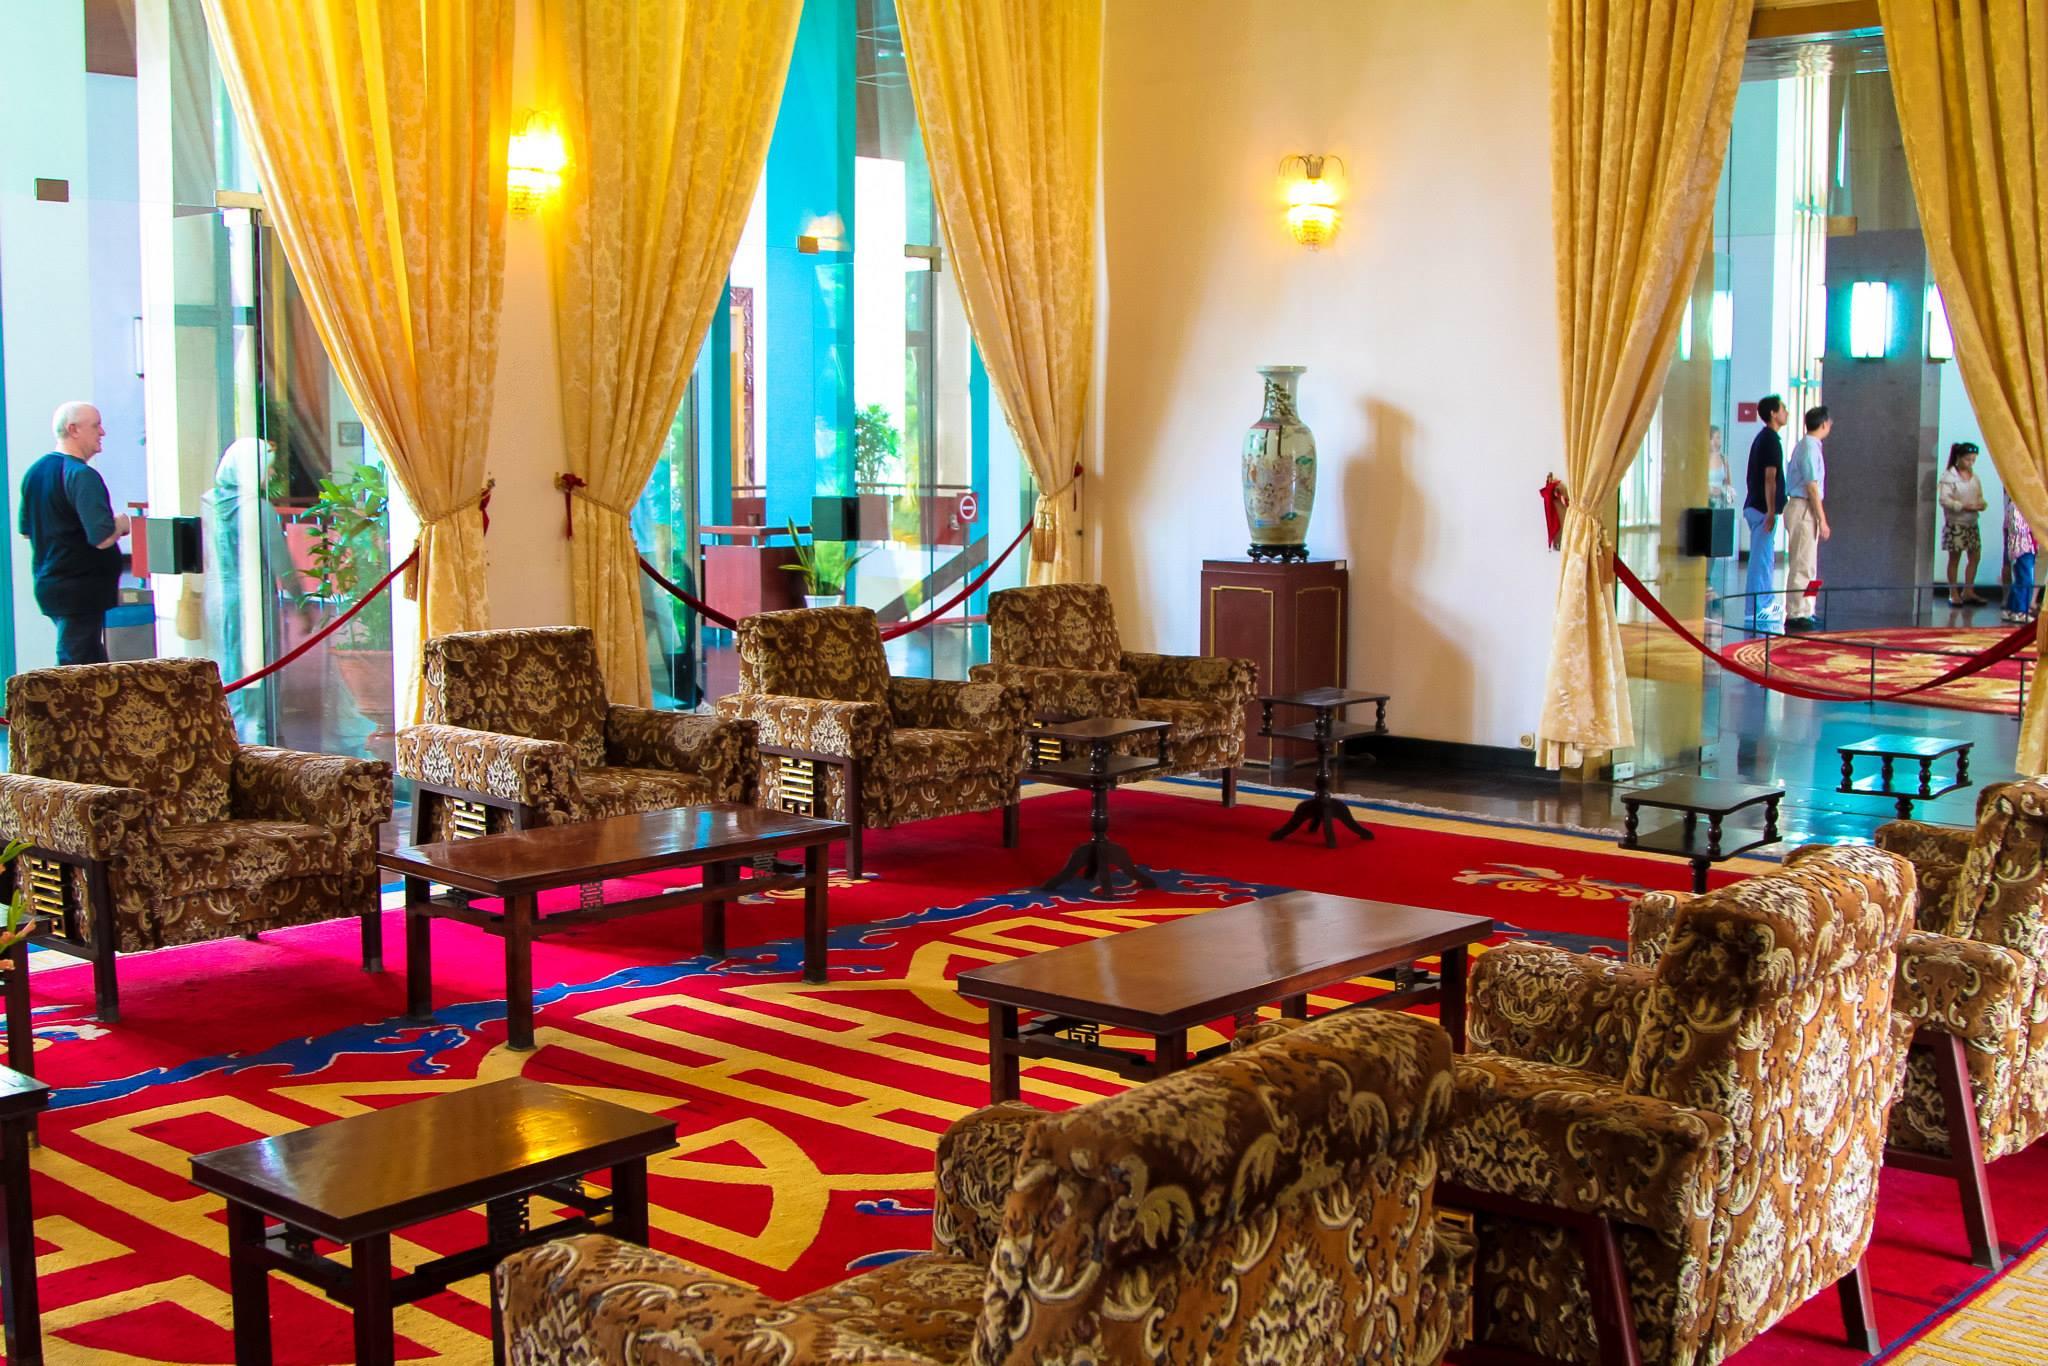 Photo Diary: Visiting Independence Palace in Saigon, Vietnam (7)